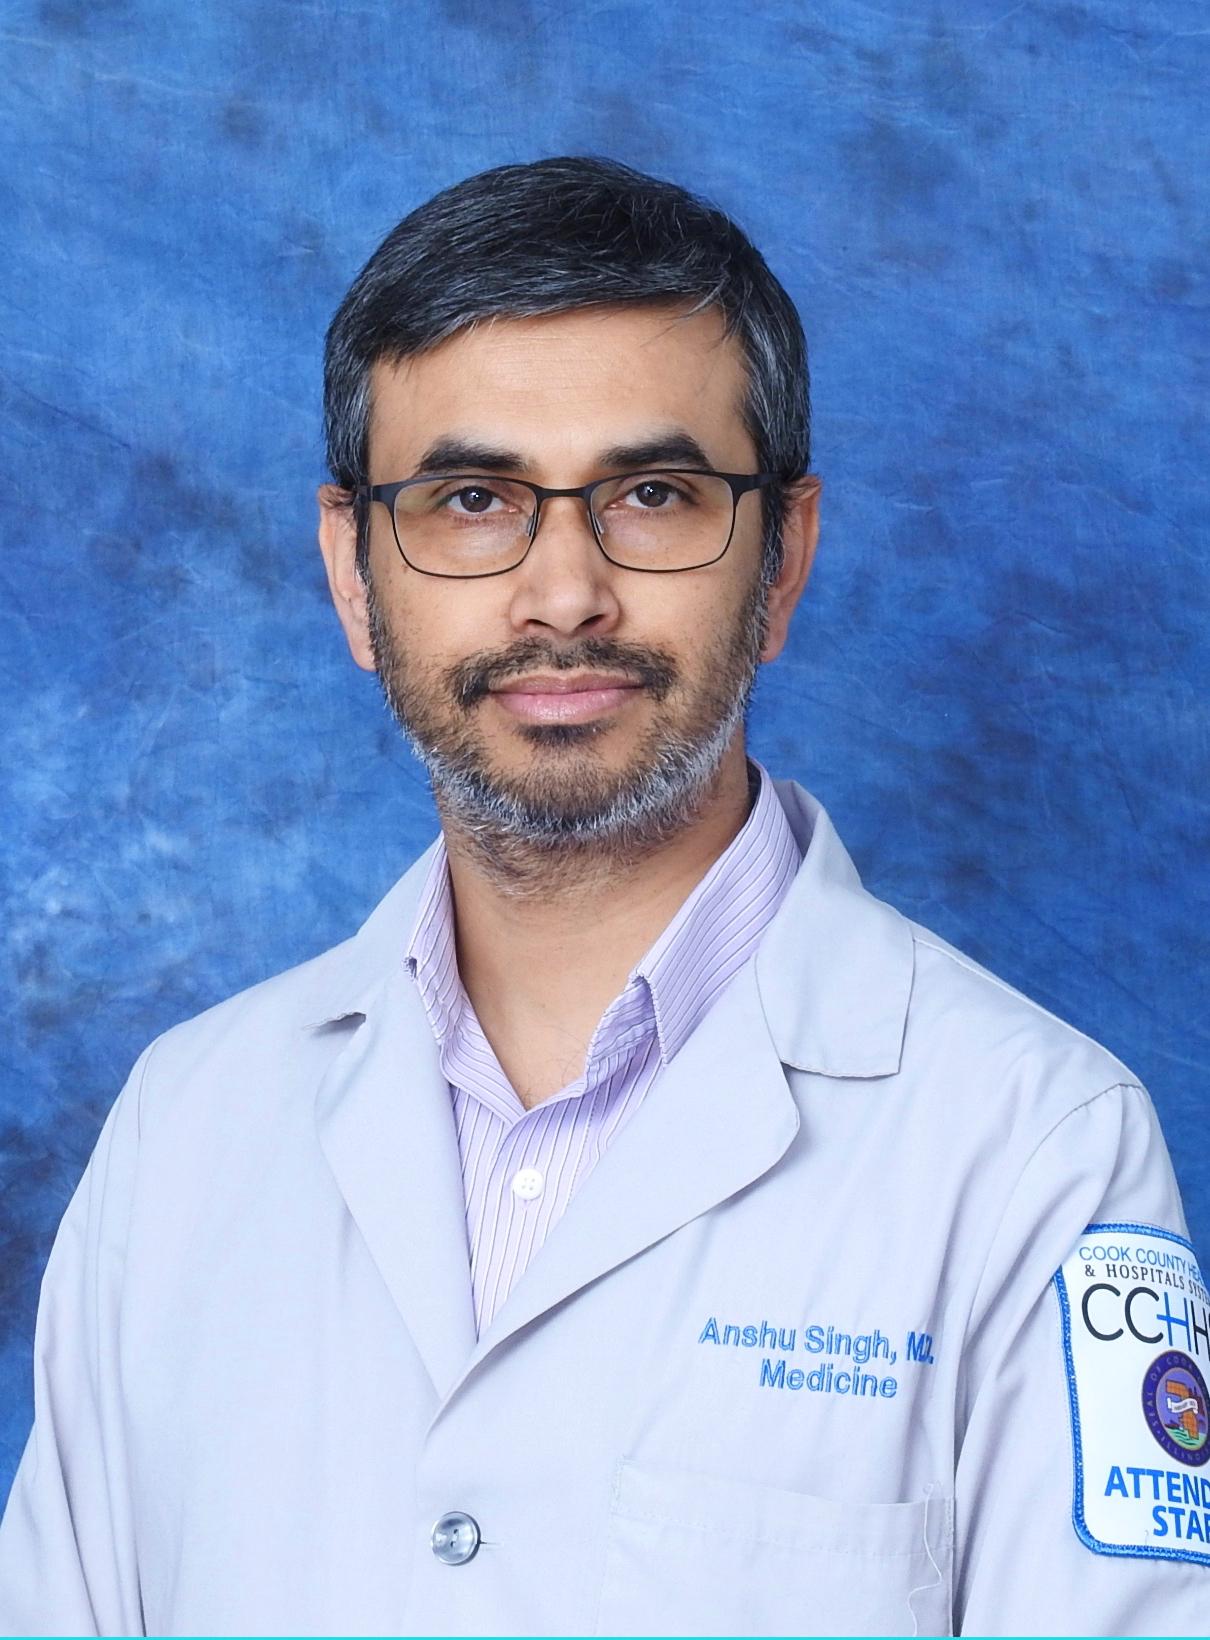 Anshu Singh, MD